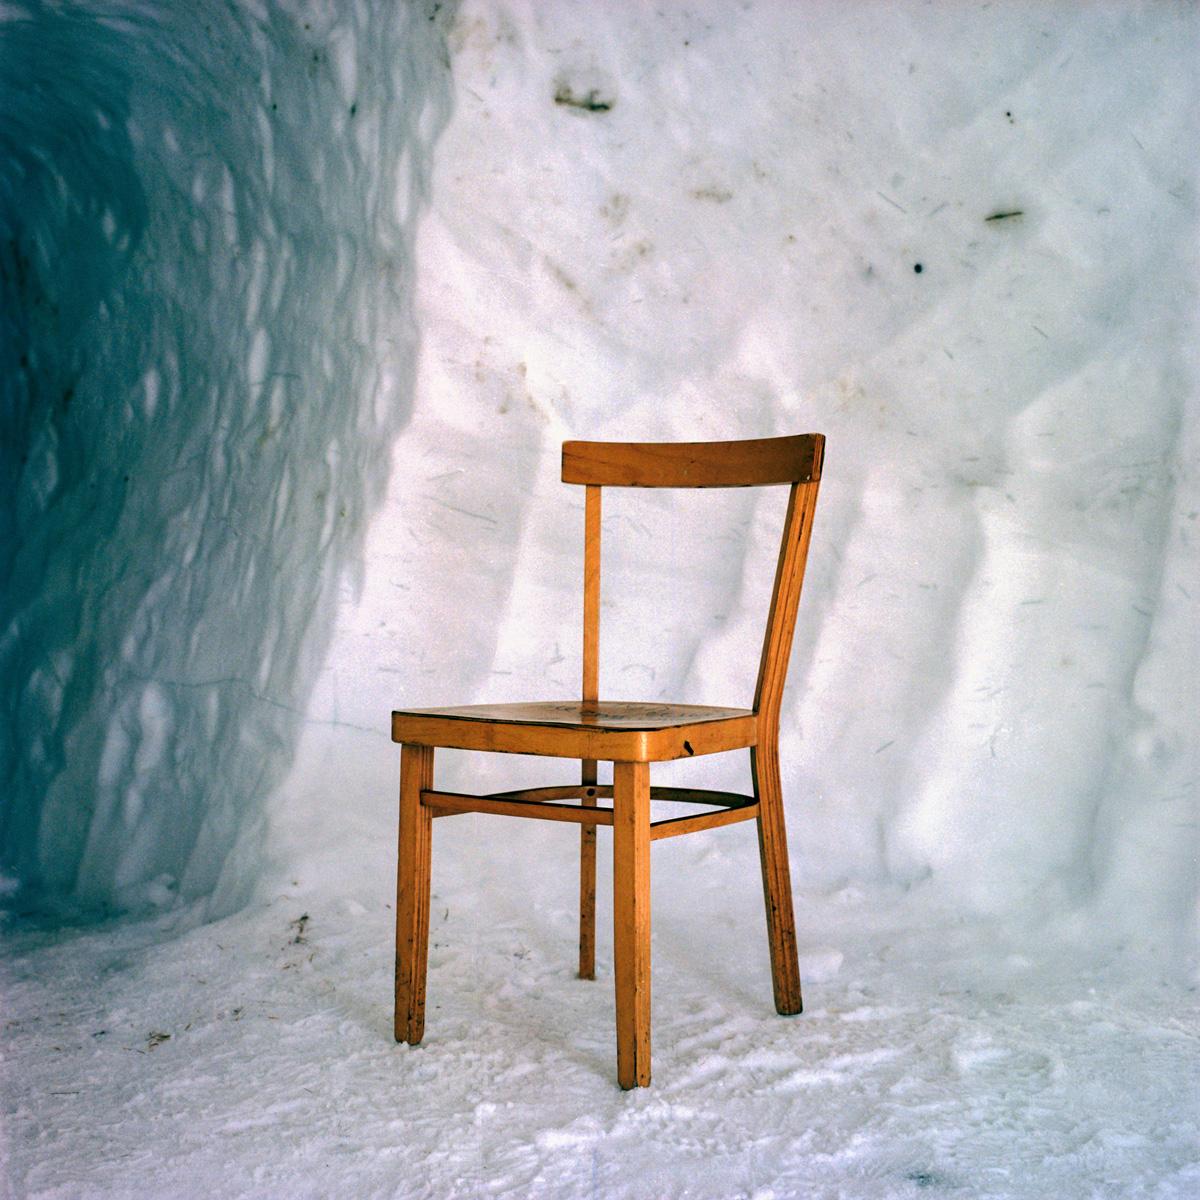 Mikhail Lebedev Snow Desert C41magazine Photography 22